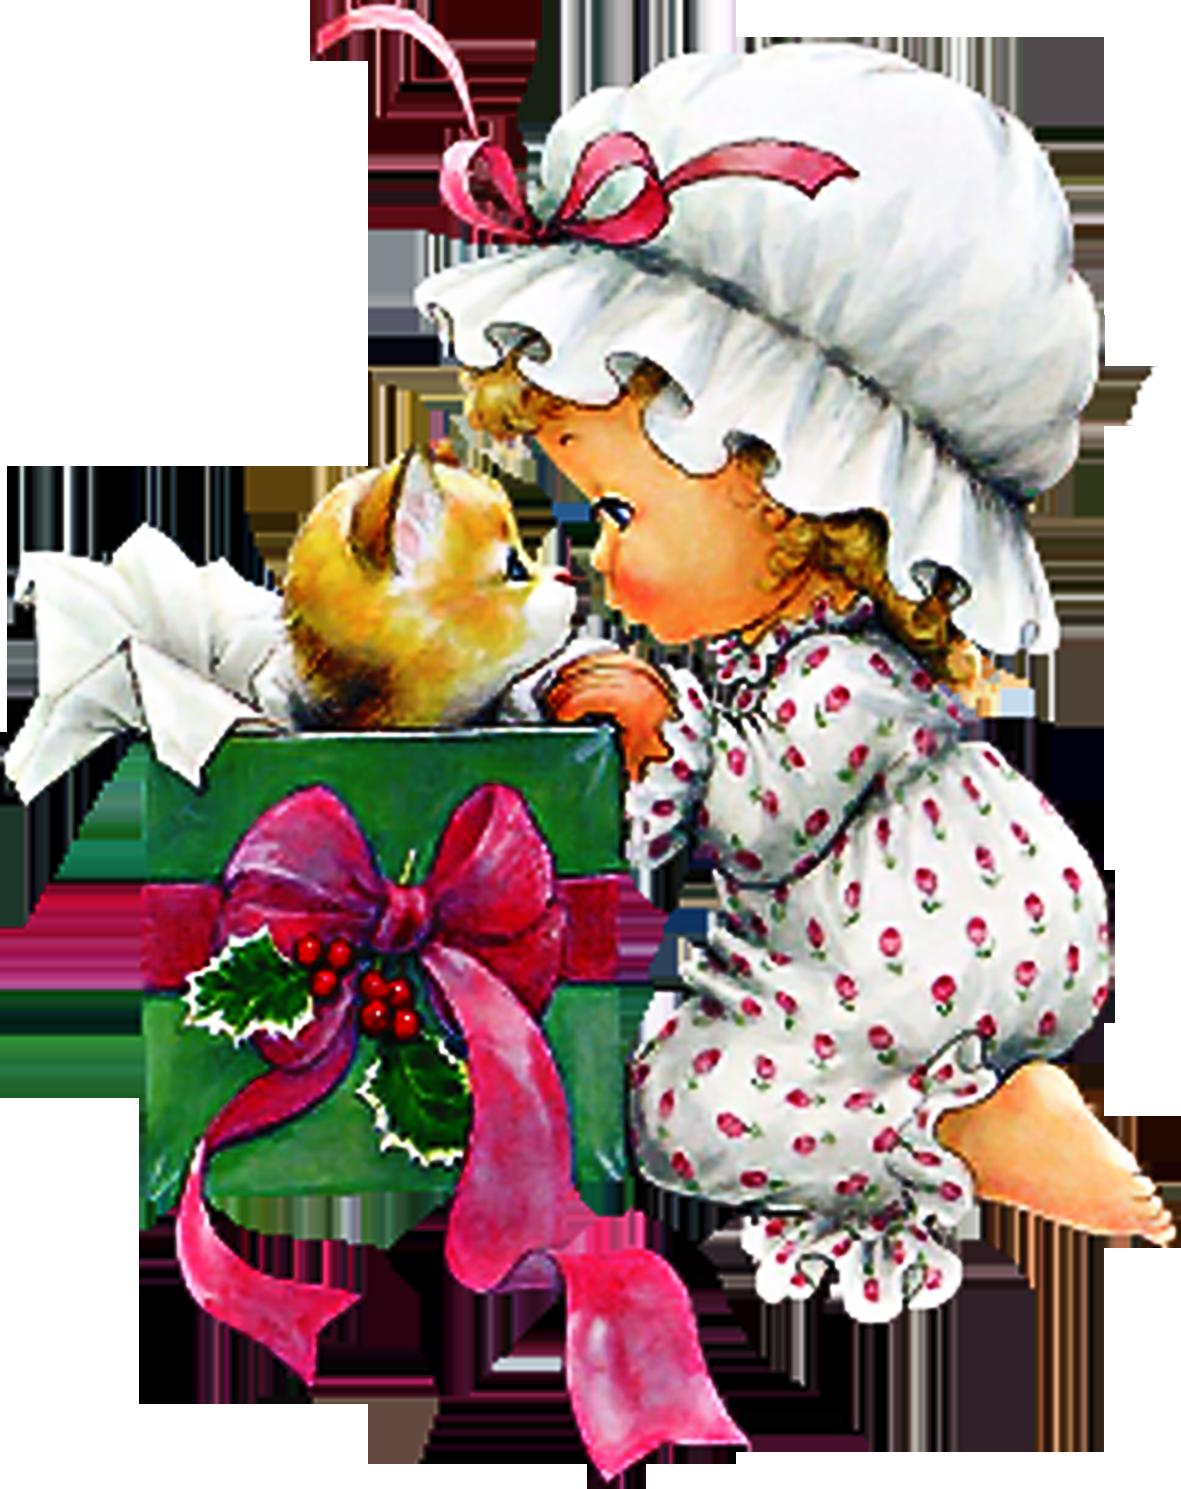 Hugging clipart christmas. Pin by liliana garcia